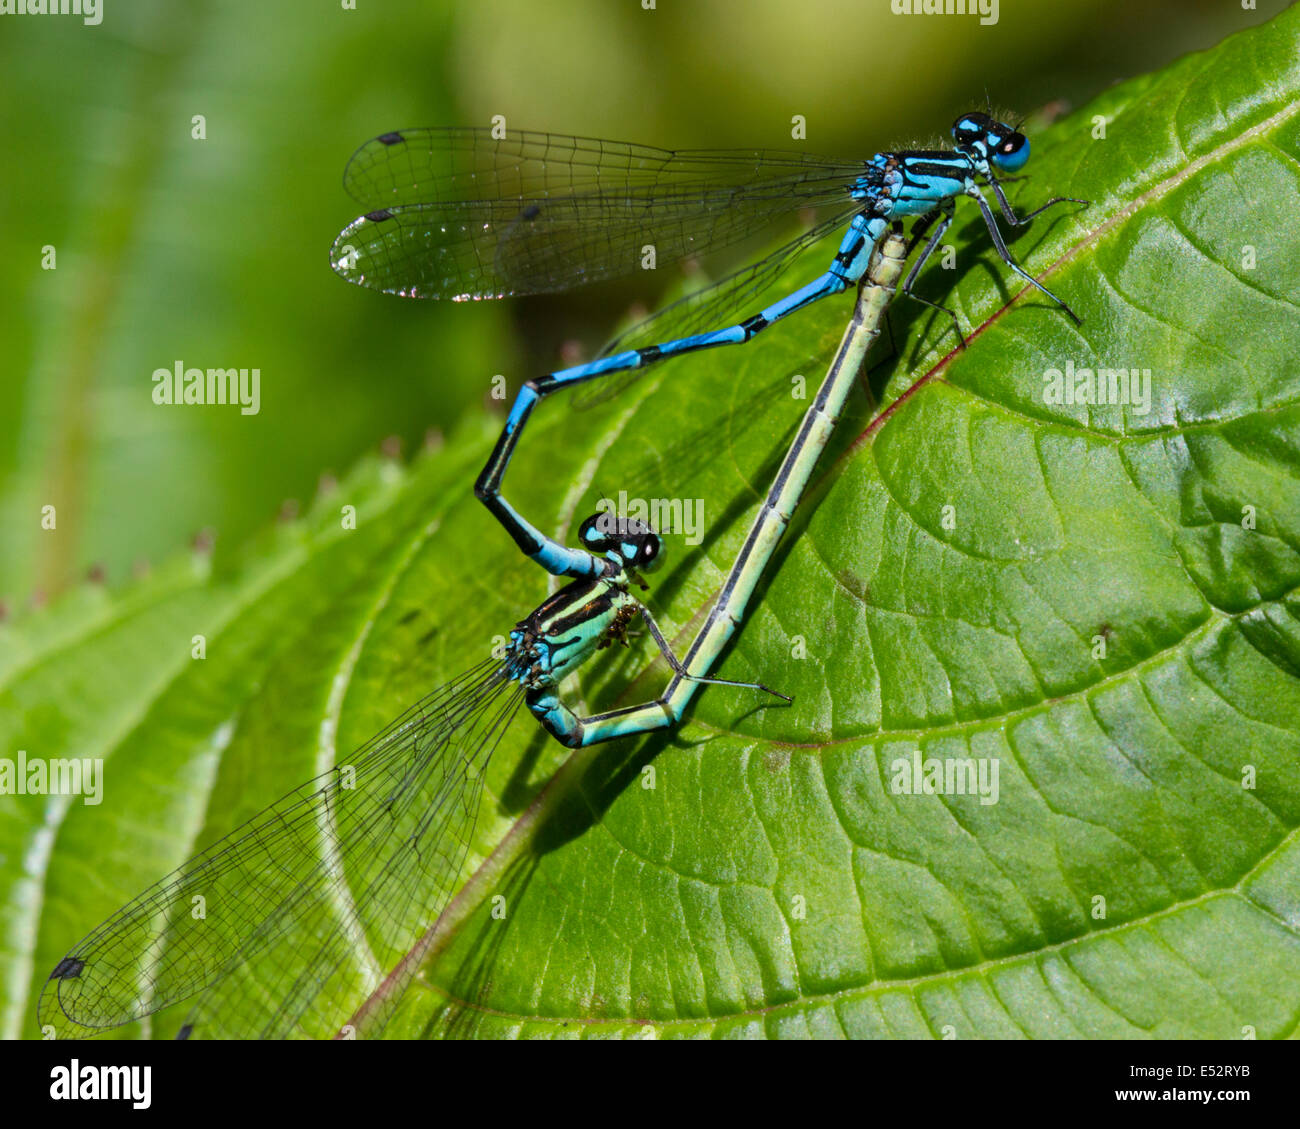 mating-wheel-of-common-blue-damselflies-enallagma-cyathigerum-E52RYB.jpg